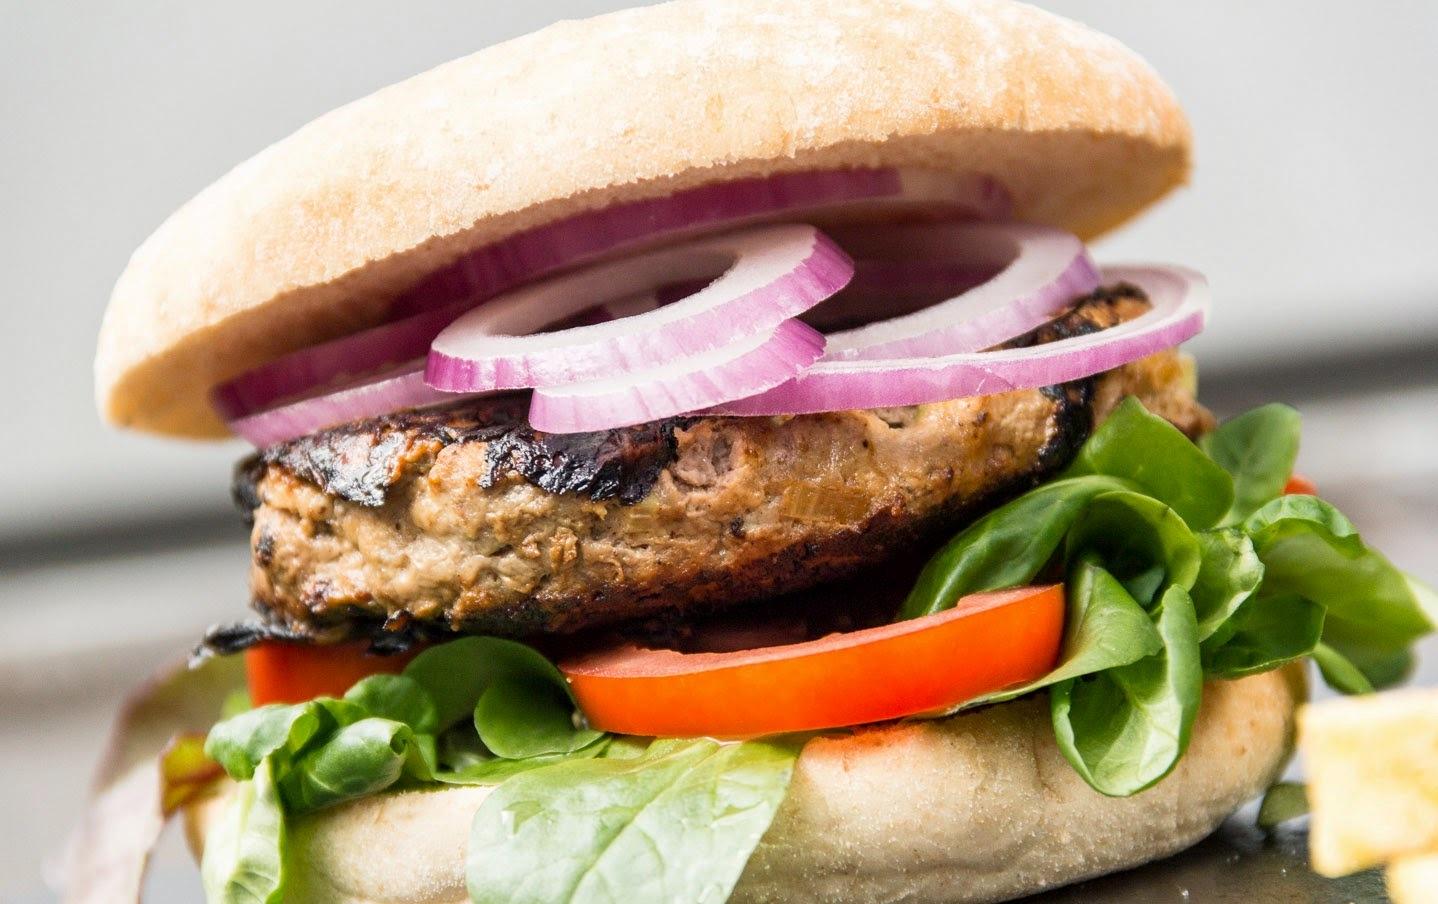 Как приготовить булочки для гамбургеров в домашних условиях с фото